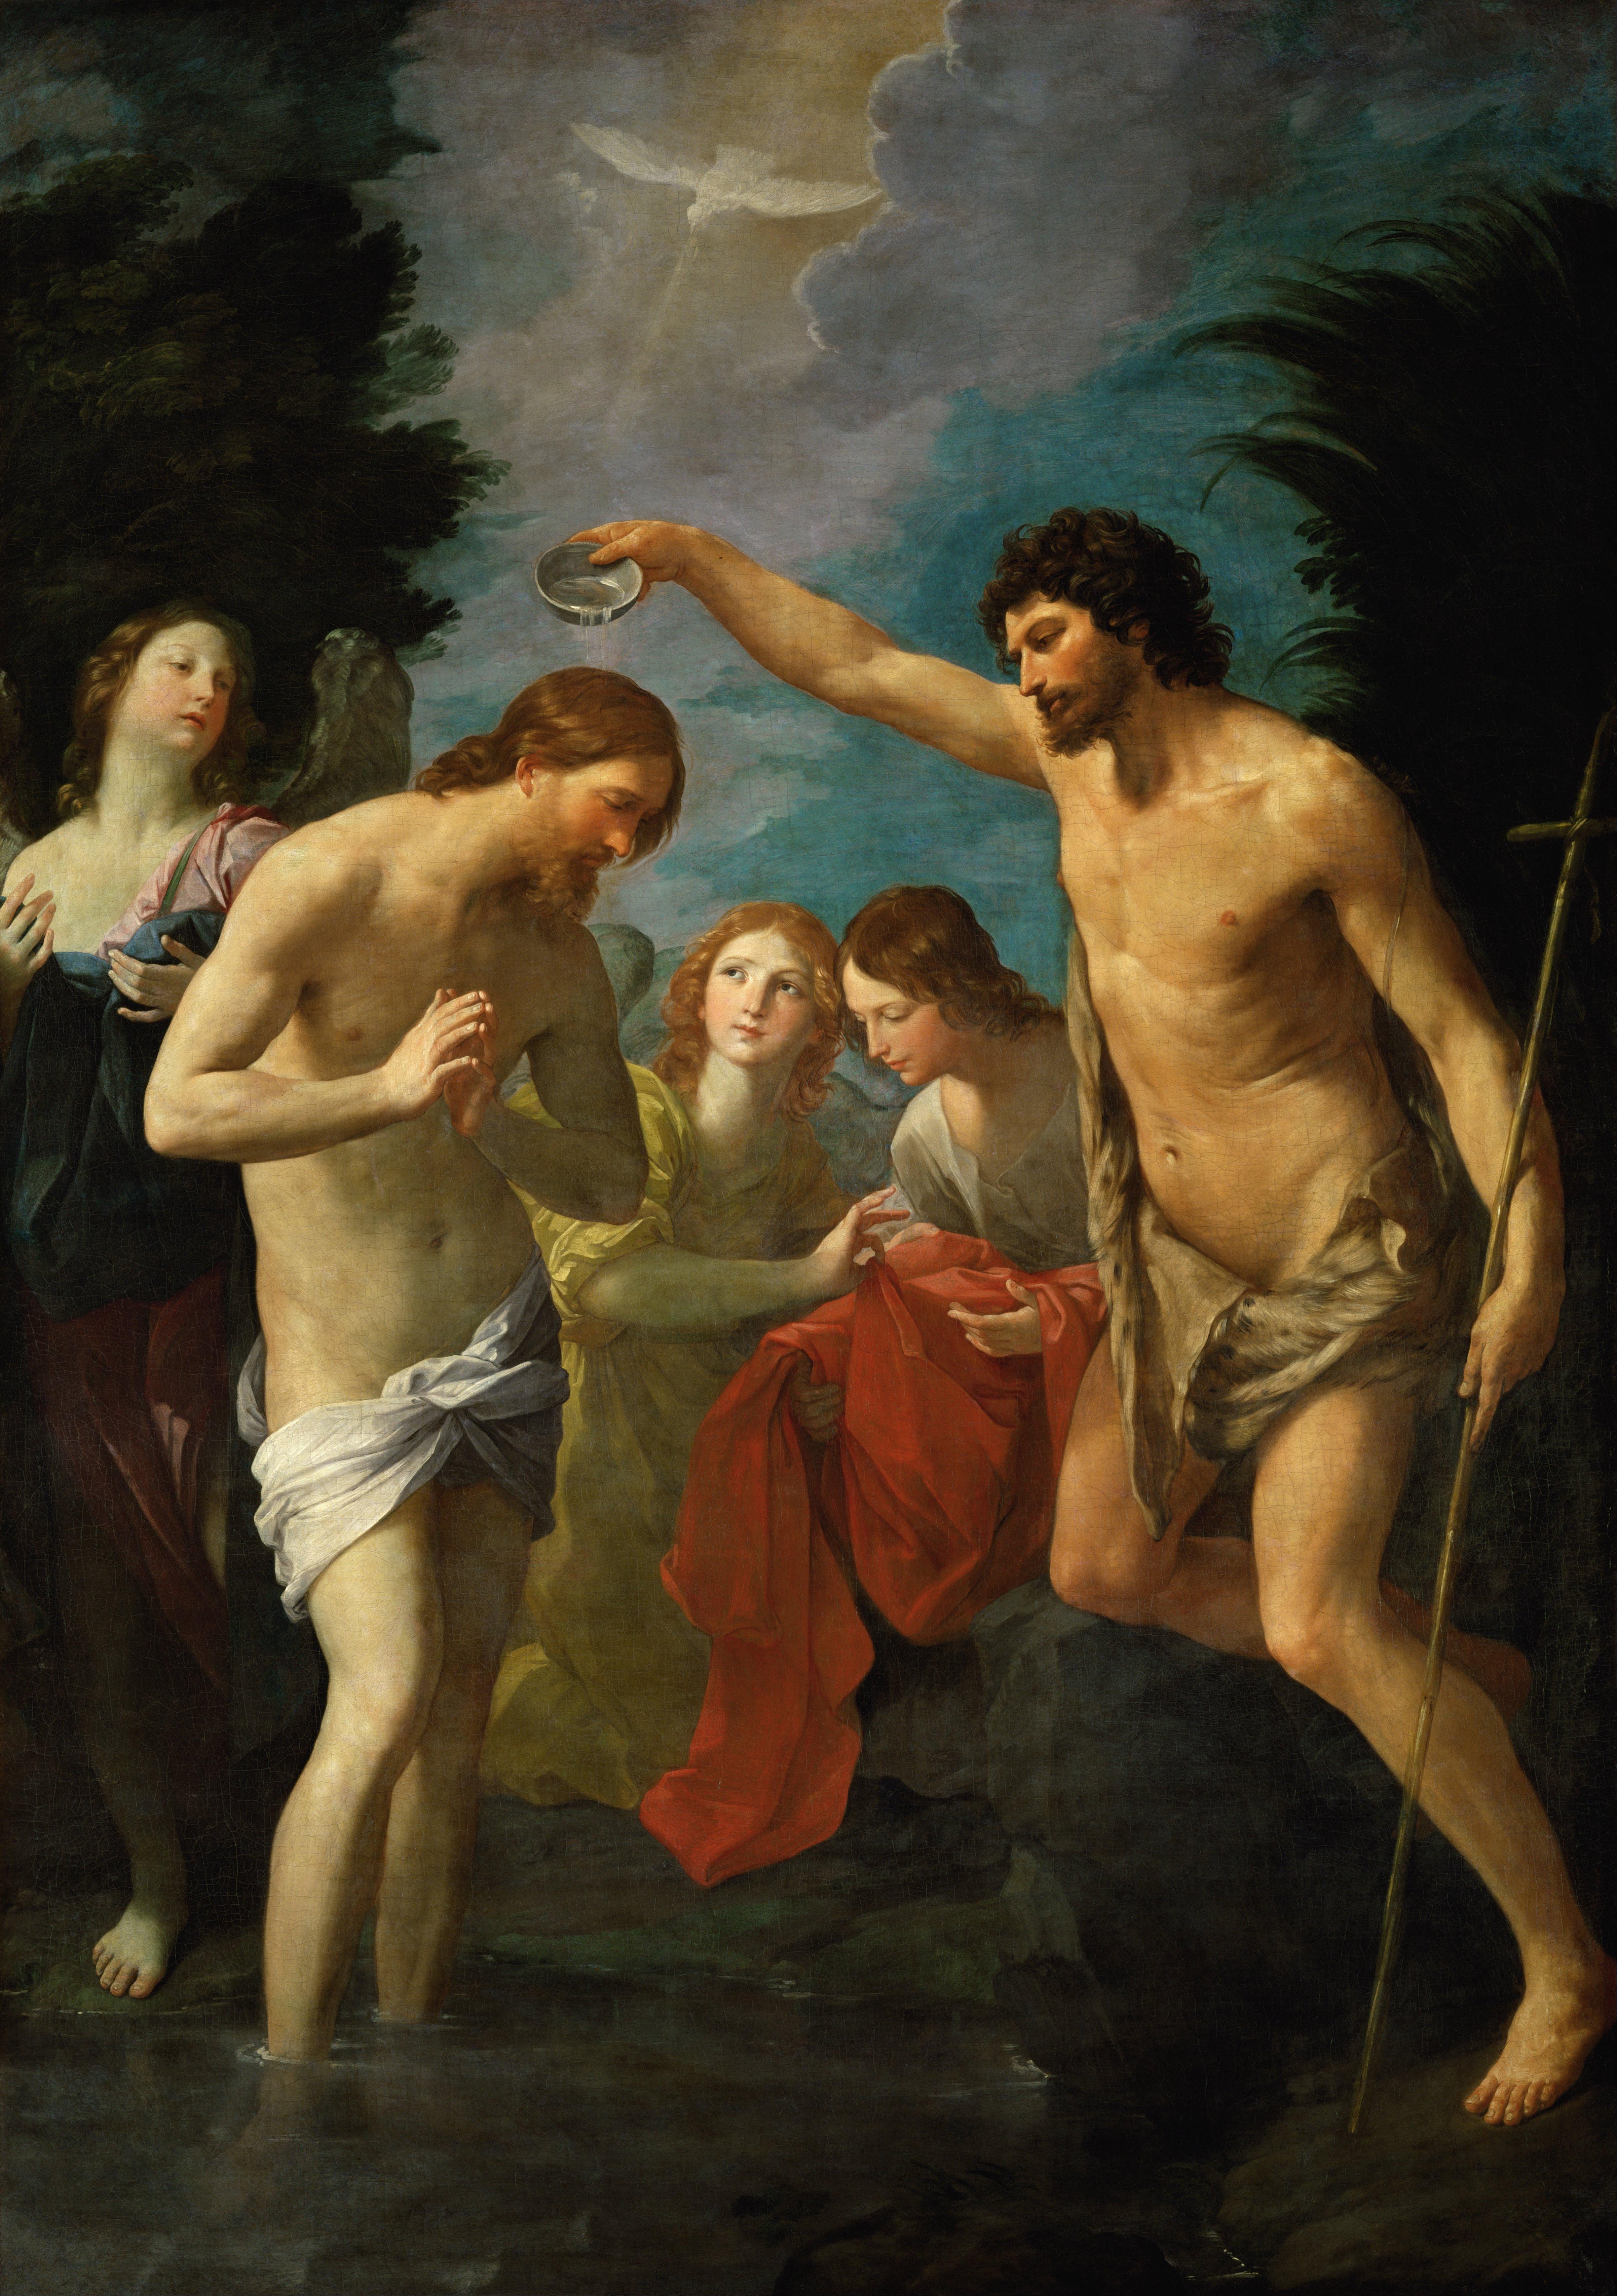 https://upload.wikimedia.org/wikipedia/commons/3/38/Guido_Reni_-_The_Baptism_of_Christ_-_Google_Art_Project.jpg